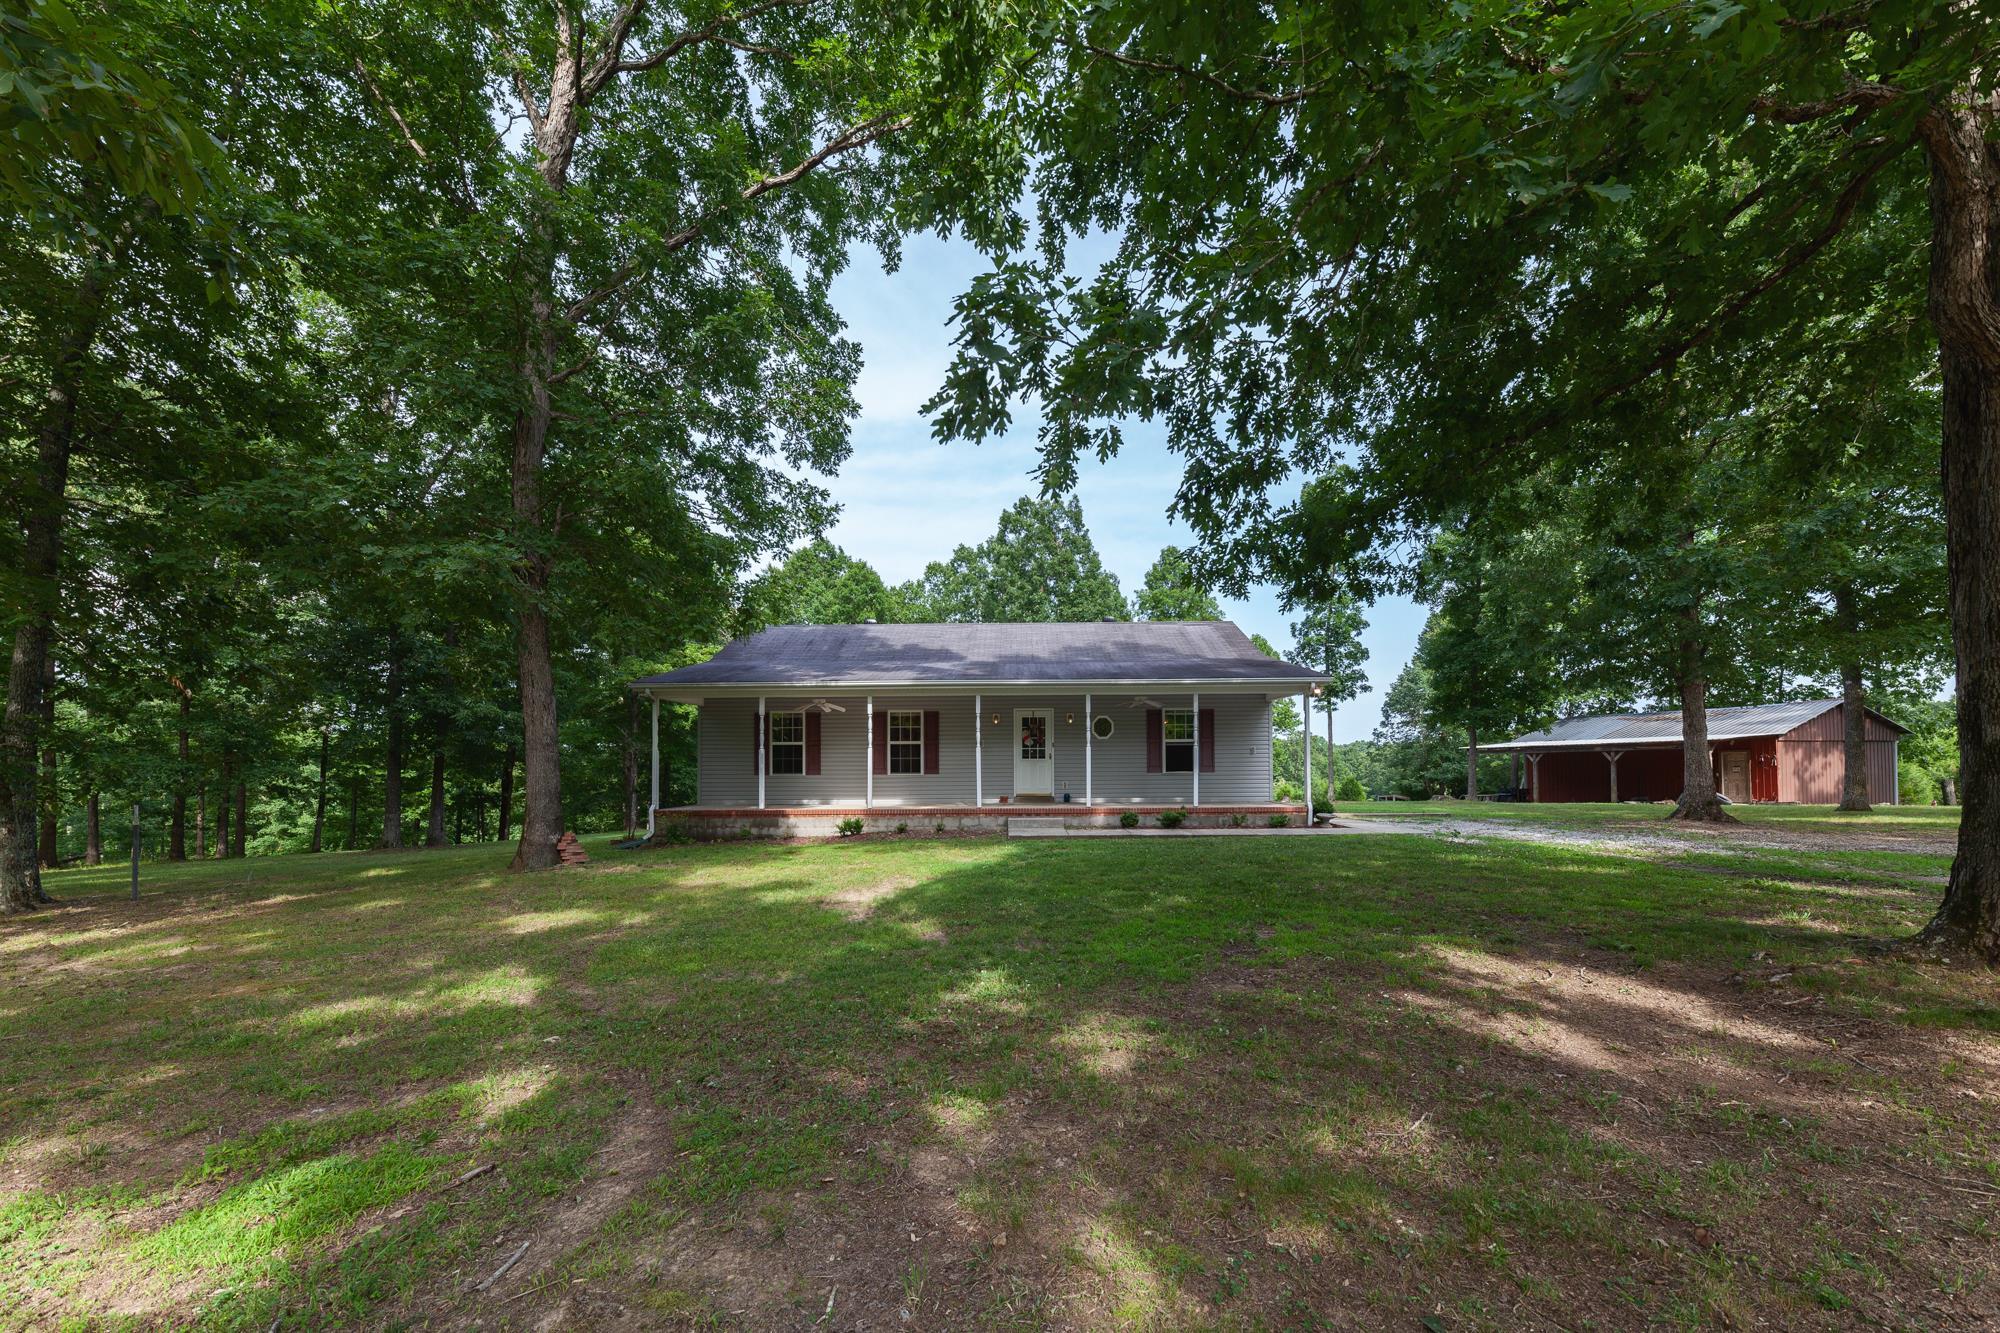 1208 Pack Rd, White Bluff, TN 37187 - White Bluff, TN real estate listing